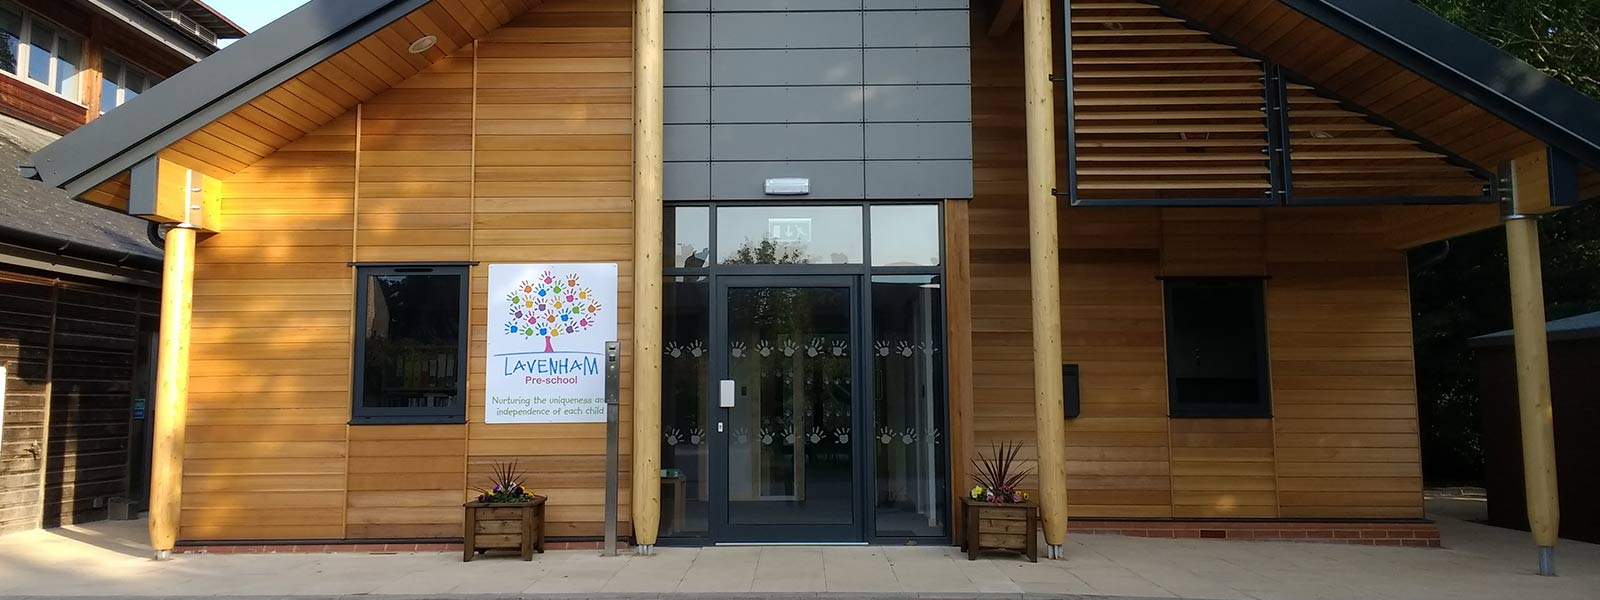 Lavenham Pre-School, Sudbury, Suffolk